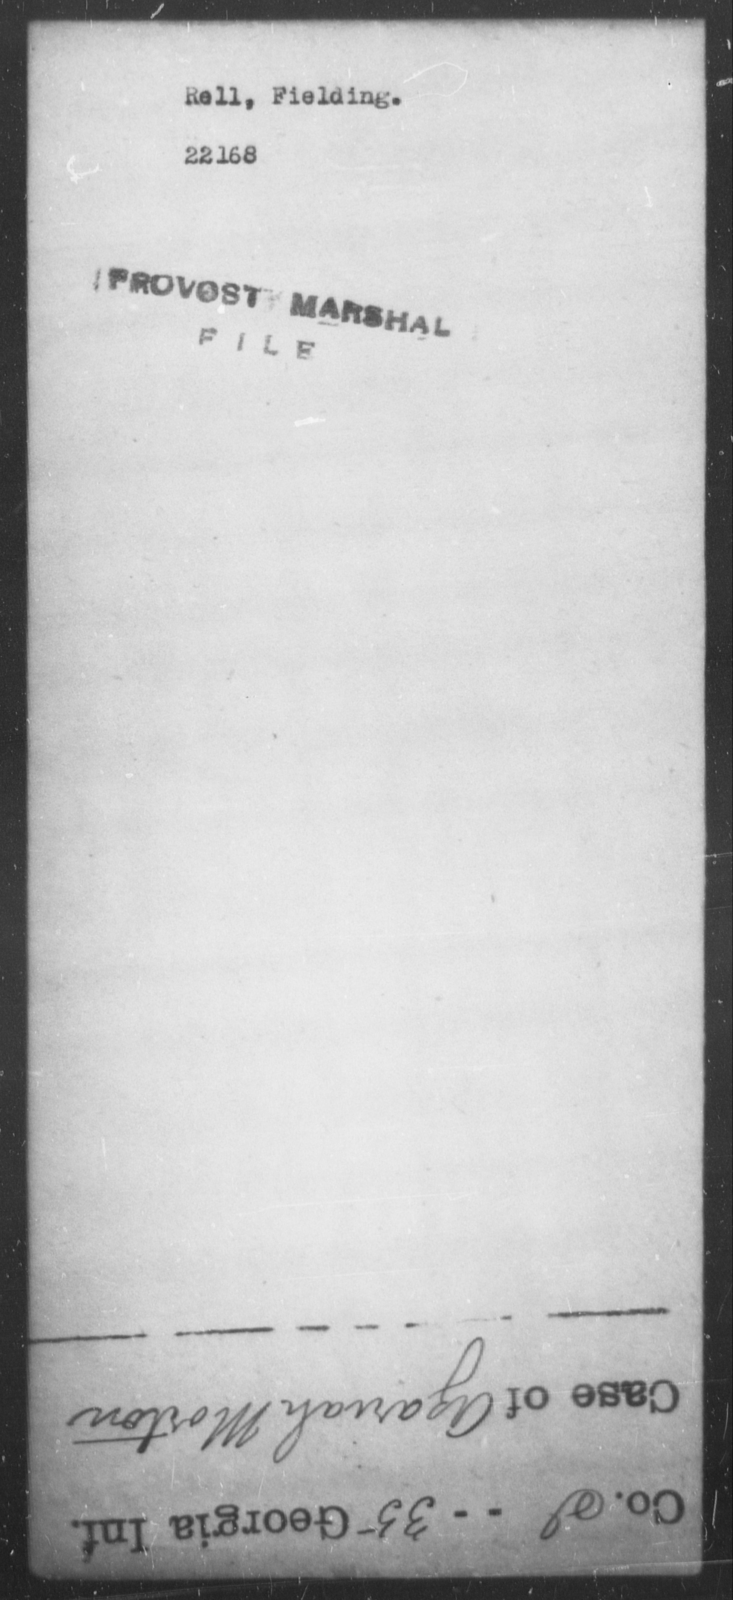 Rell, Fielding - State: [Blank] - Year: [Blank]